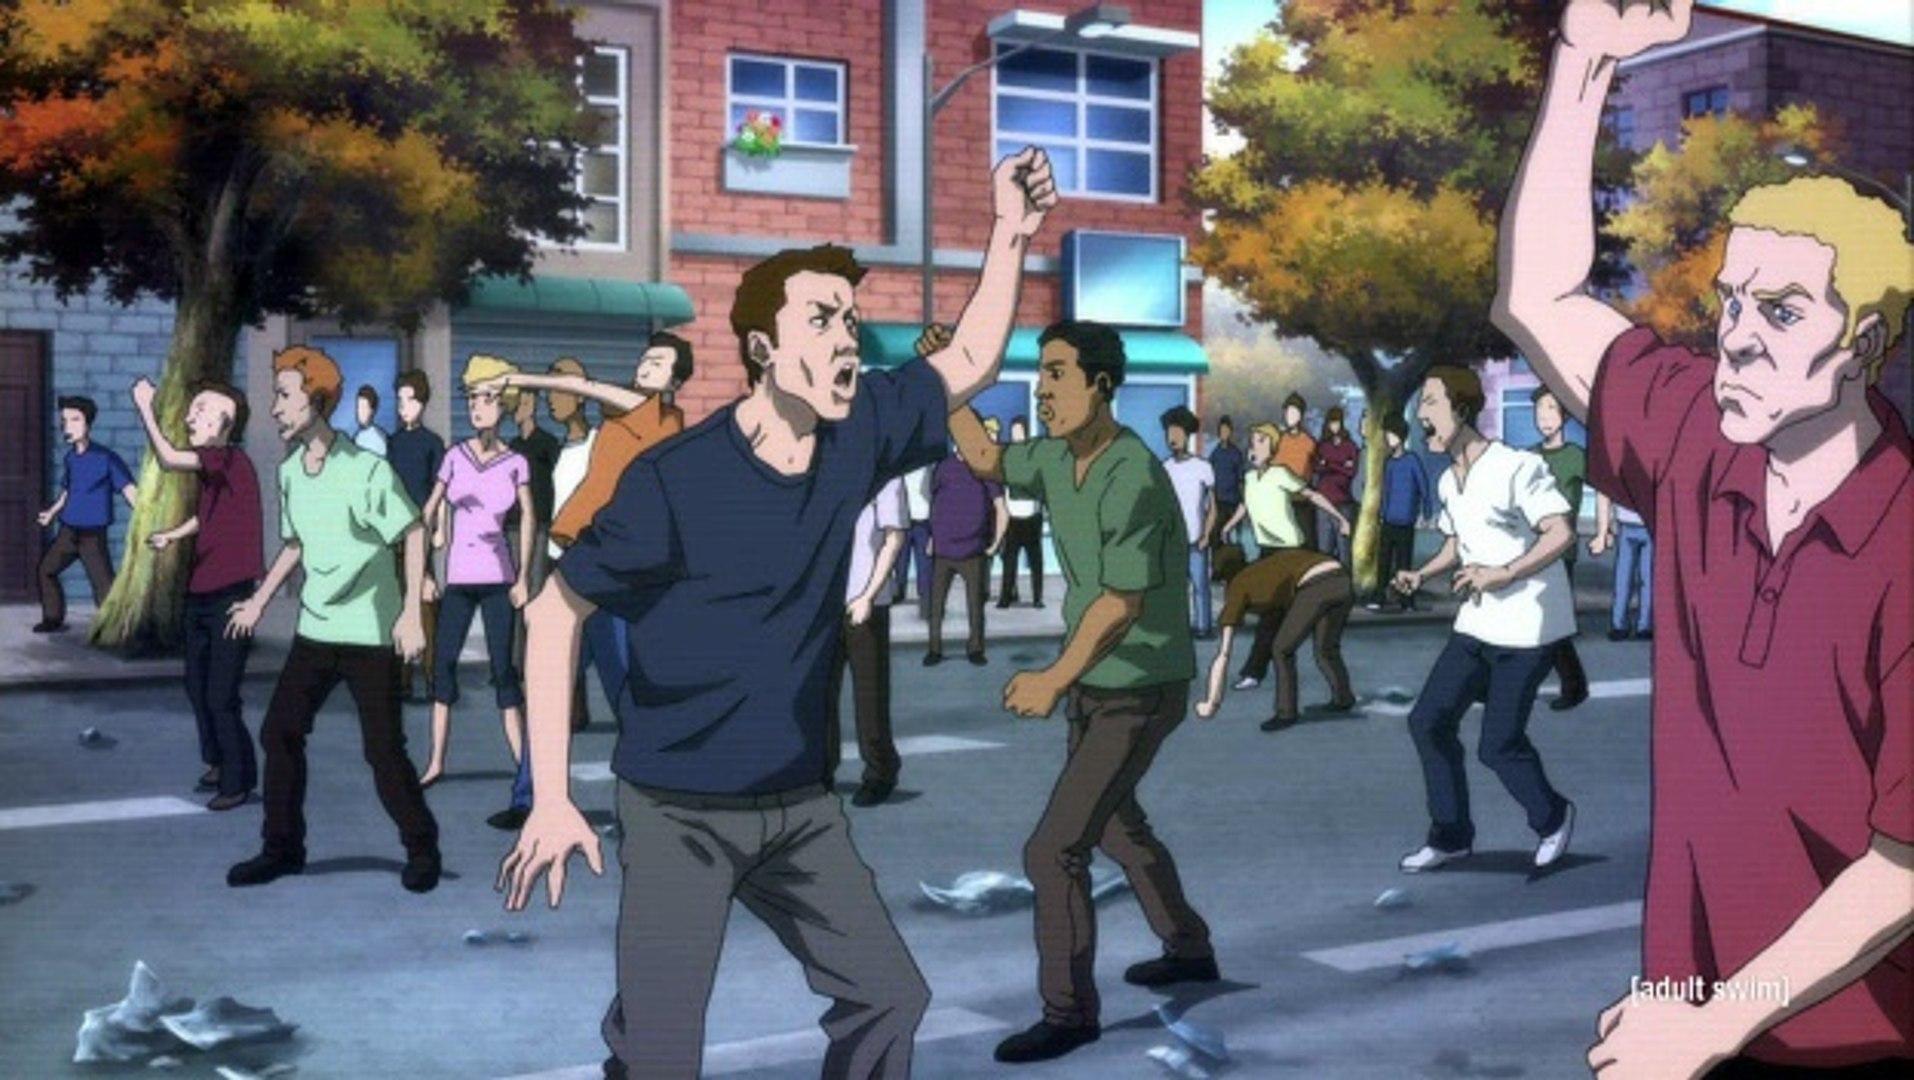 The Boondocks S03E13